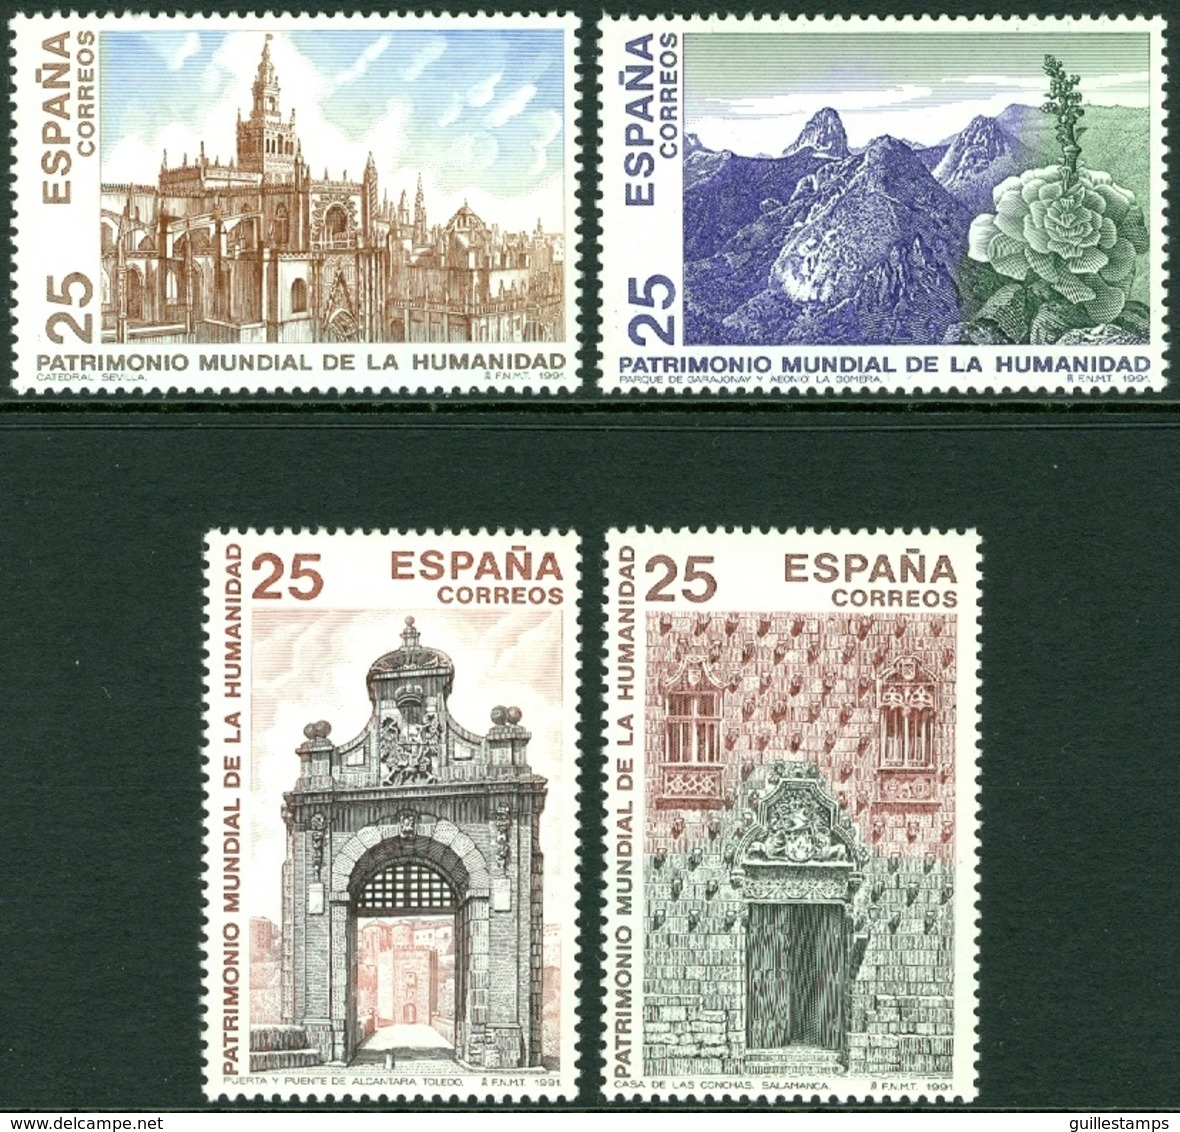 SPAIN 1991 UNESCO WORLD HERITAGE SITES** (MNH) - 1931-Hoy: 2ª República - ... Juan Carlos I